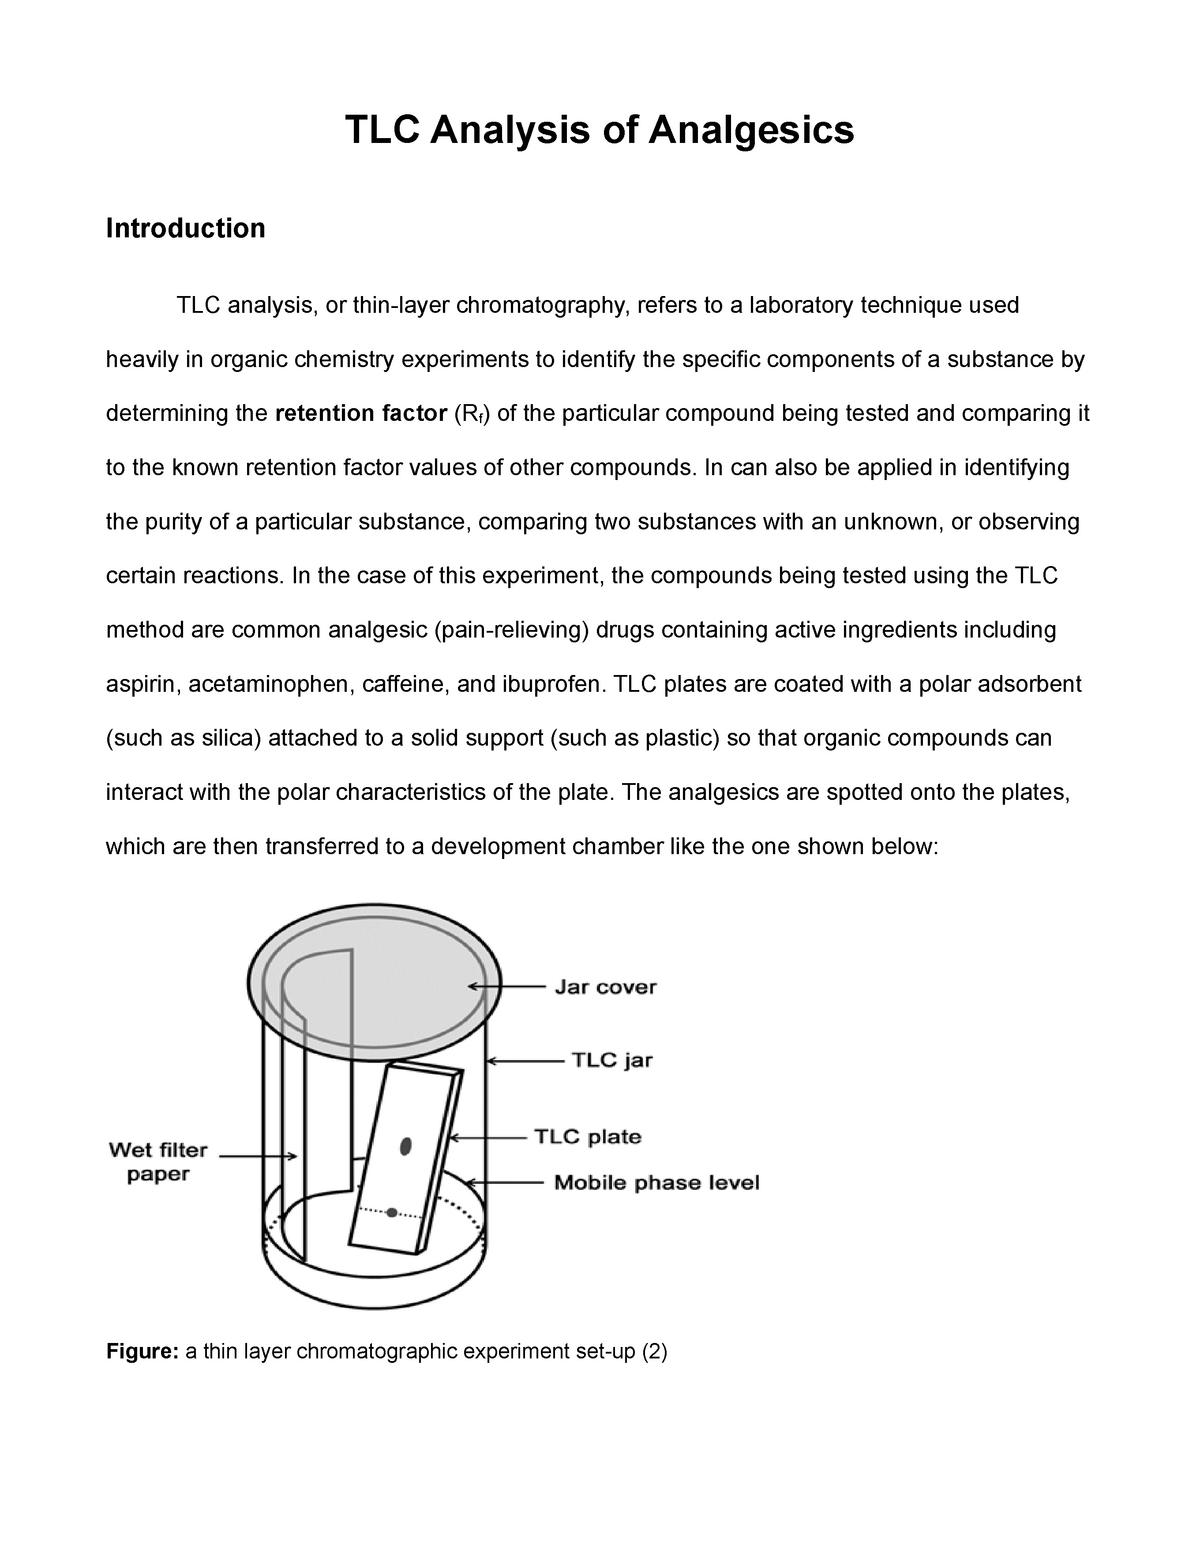 tlc analysis of analgesics - chem 2131l